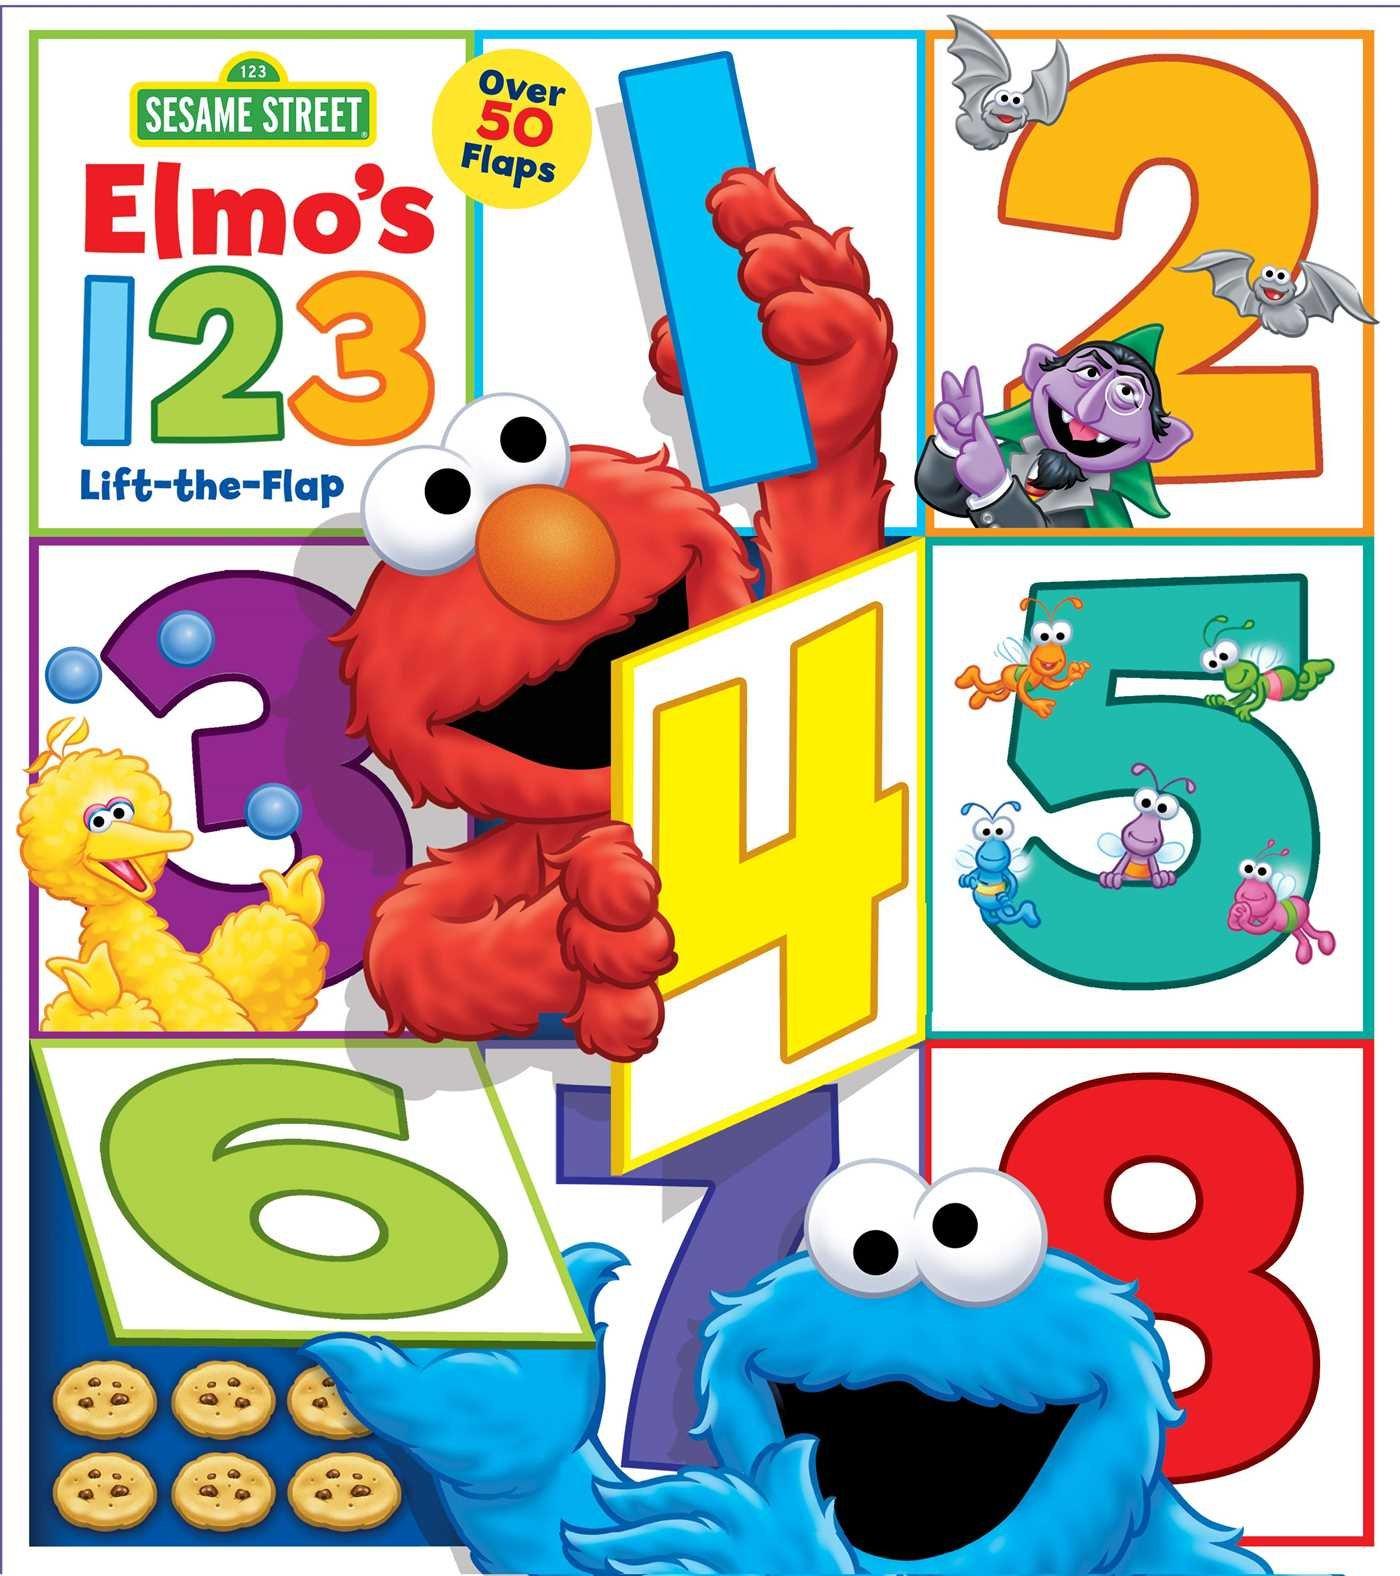 Elmo's 123 Lift-the-Flap | Muppet Wiki | FANDOM powered by Wikia